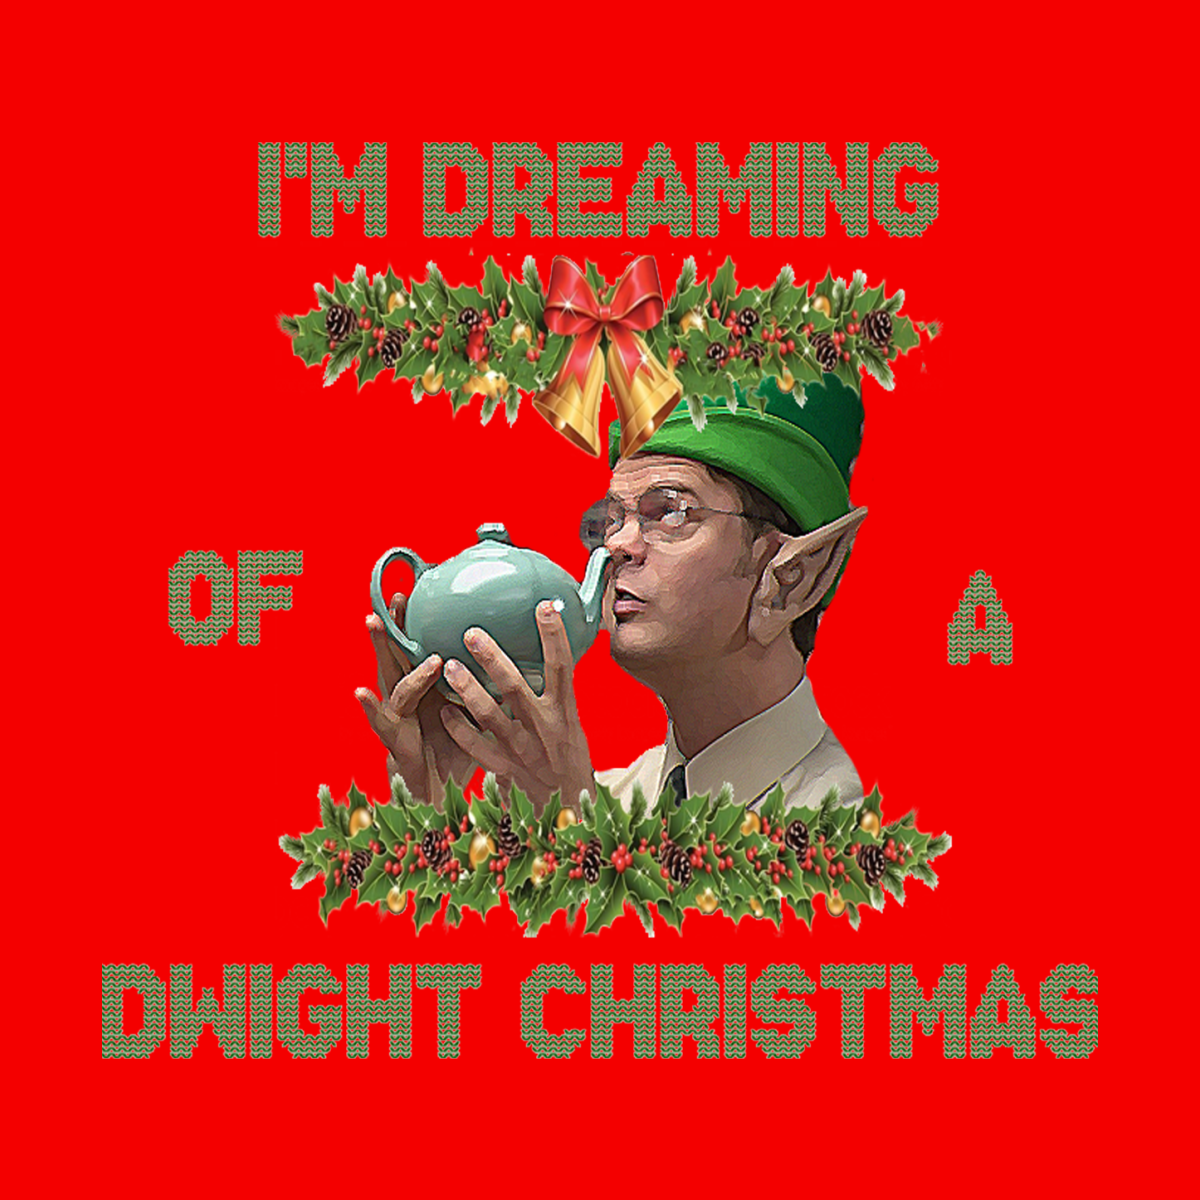 Dwight Christmas.Dwight Christmas